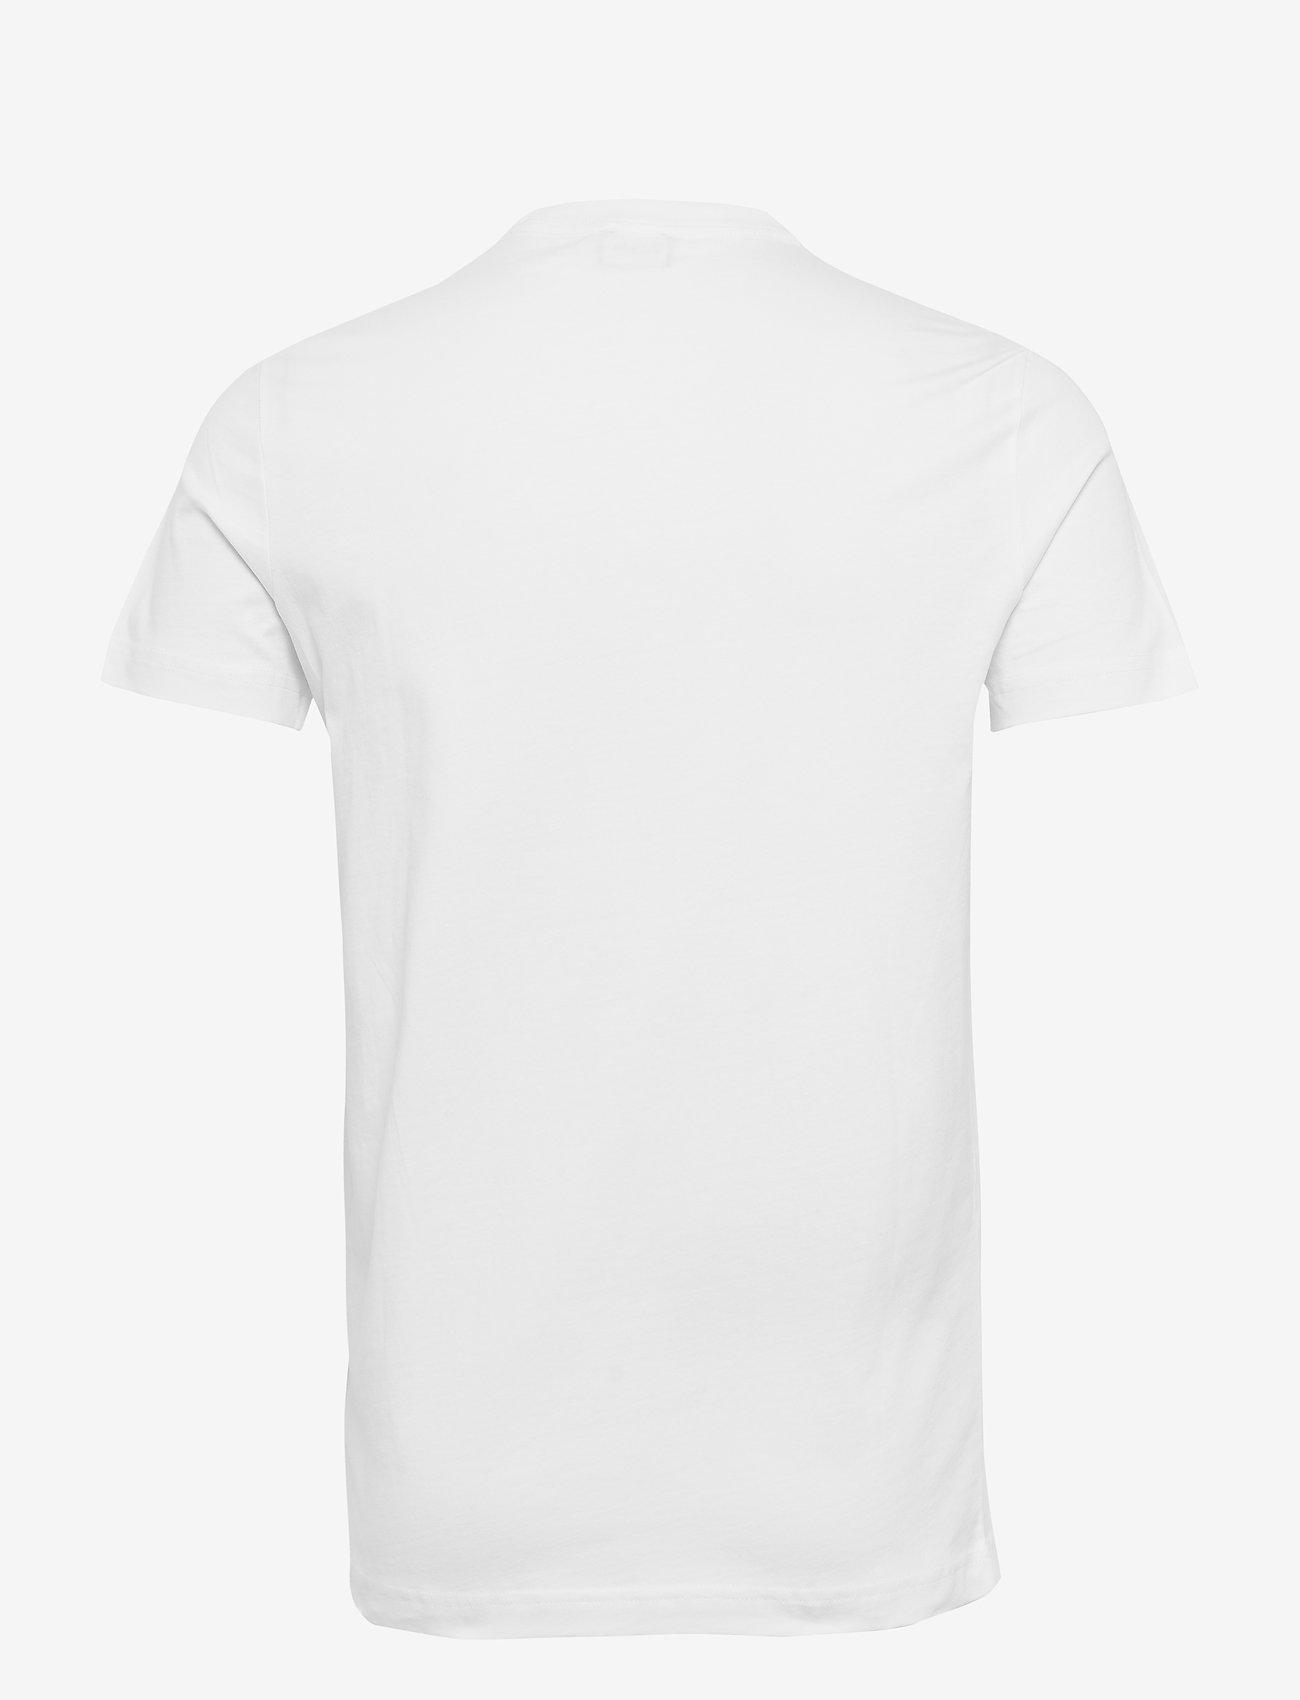 Diesel Men - T-DIEGO-LOGO T-SHIRT - short-sleeved t-shirts - bright white - 1